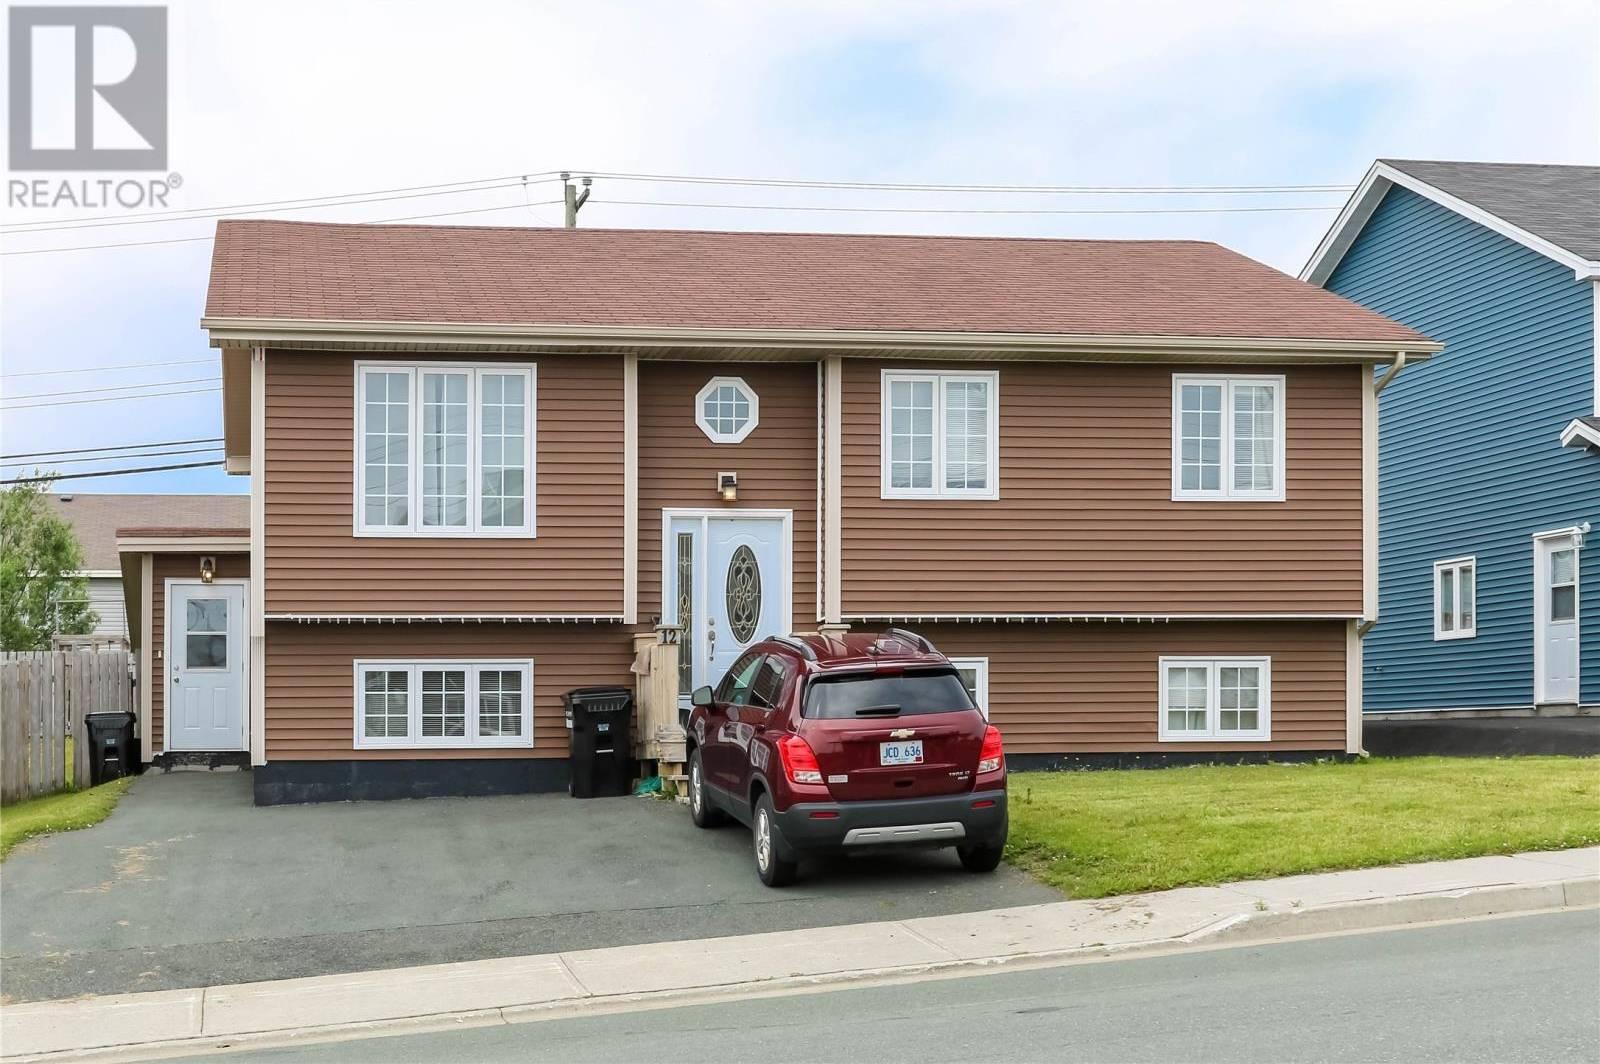 House for sale at 12 Caribou Pl St. John's Newfoundland - MLS: 1201026